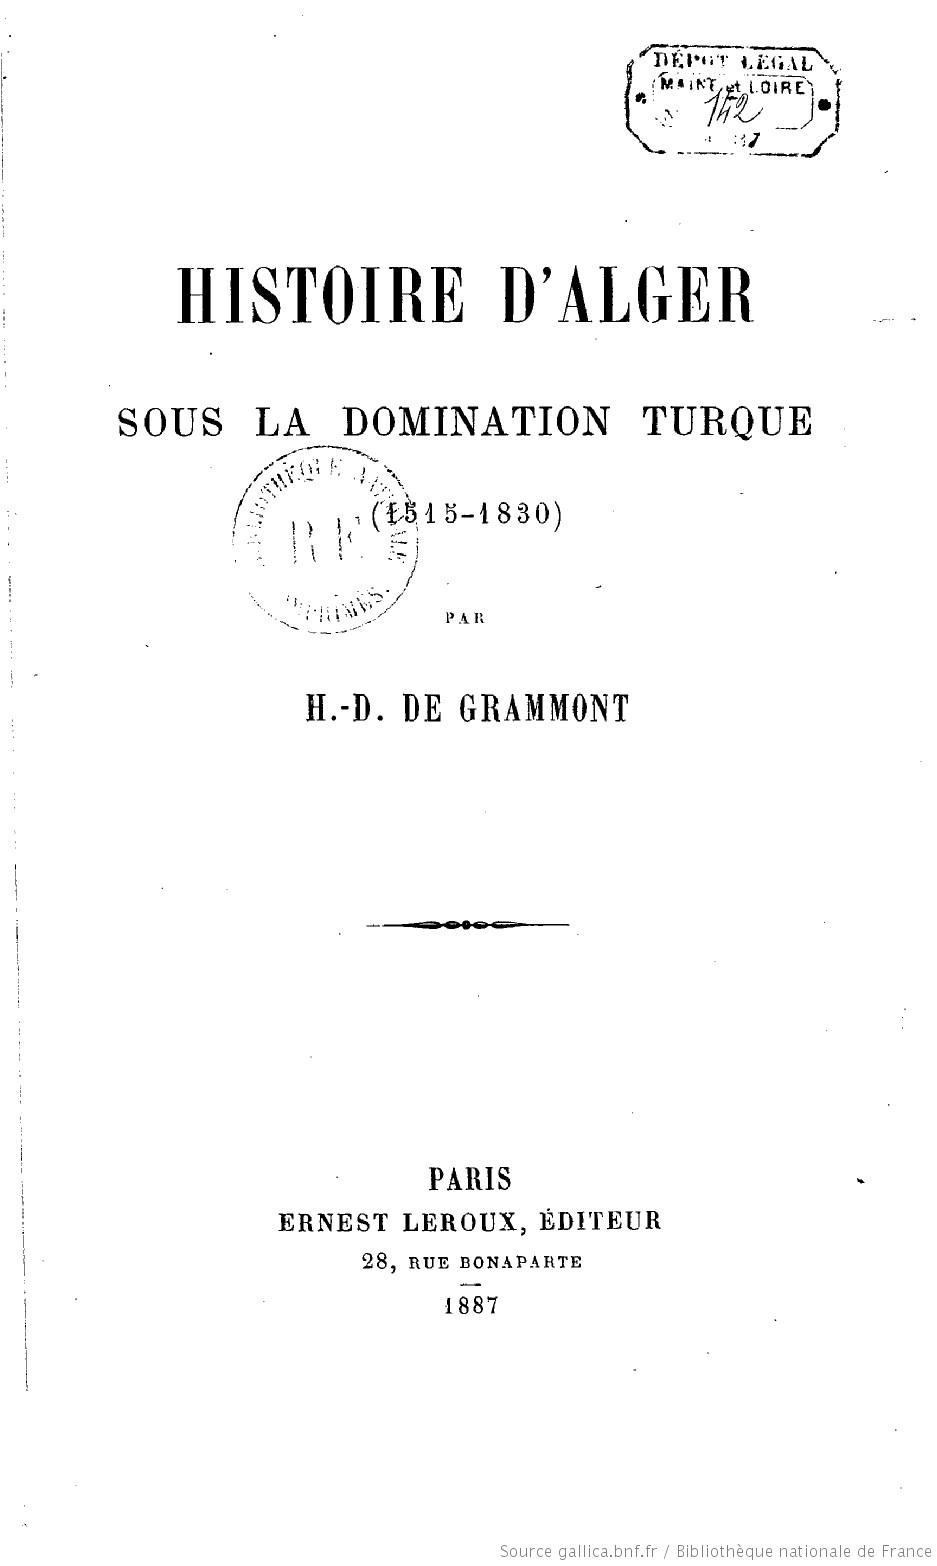 http://gallica.bnf.fr/ark:/12148/bpt6k57894551/f12.highres